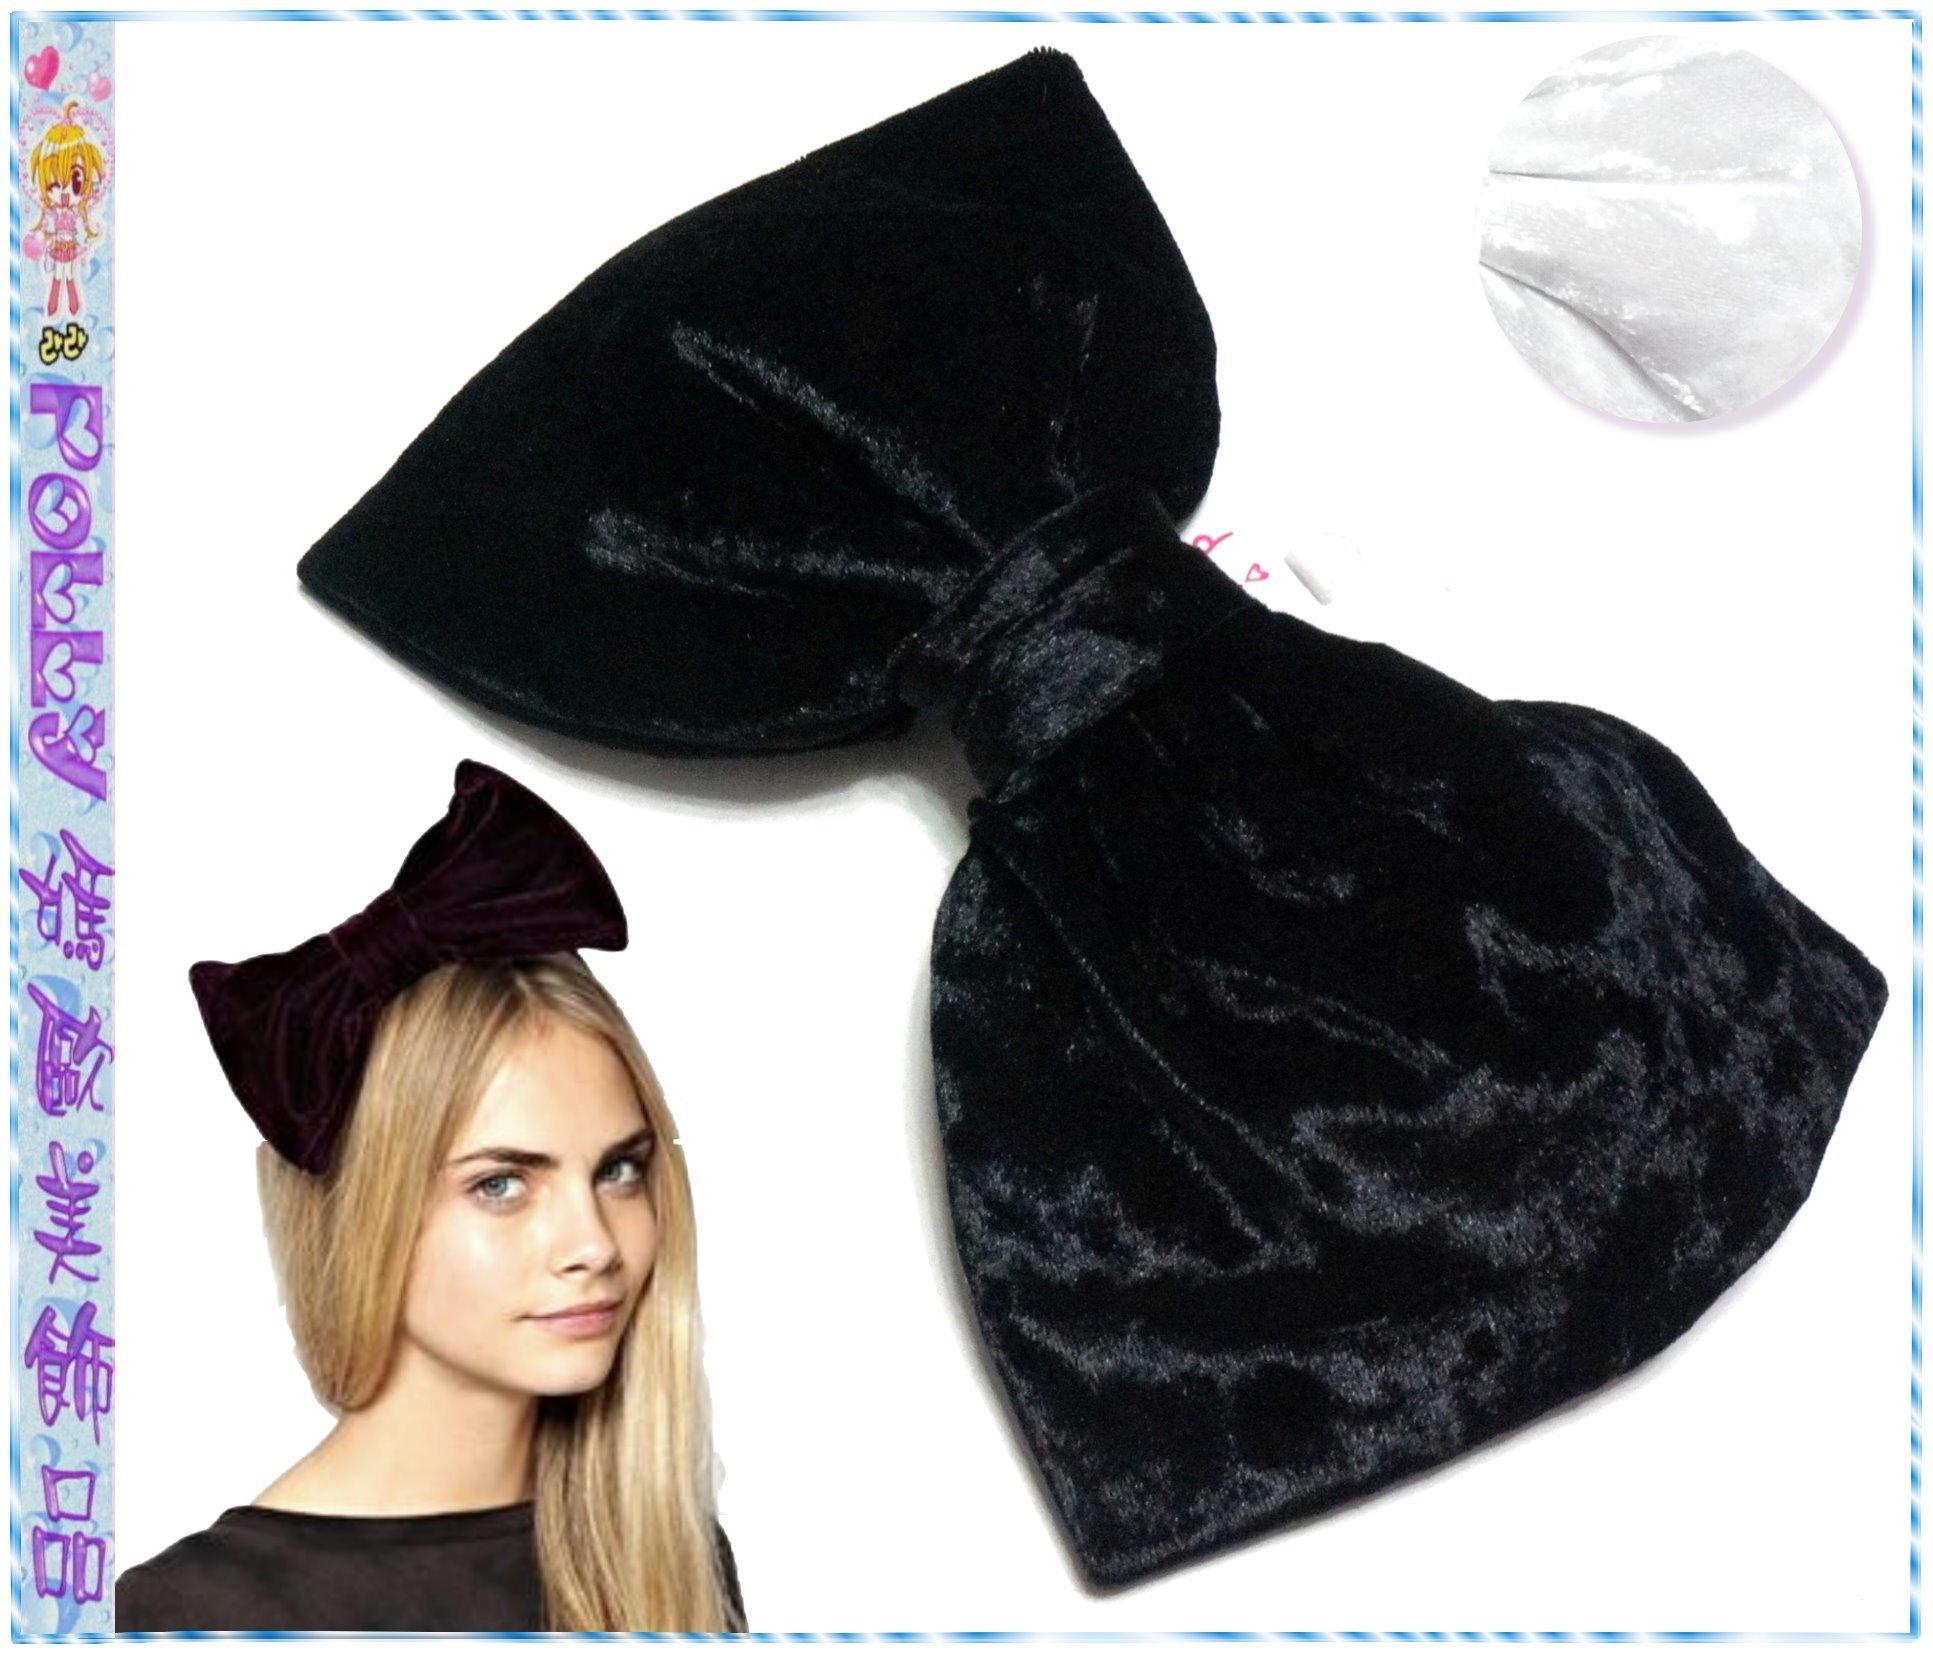 ☆POLLY媽☆歐美diva黑色、白色絲絨超大蝴蝶結(15.5×25.5cm)彈簧夾、鴨嘴夾